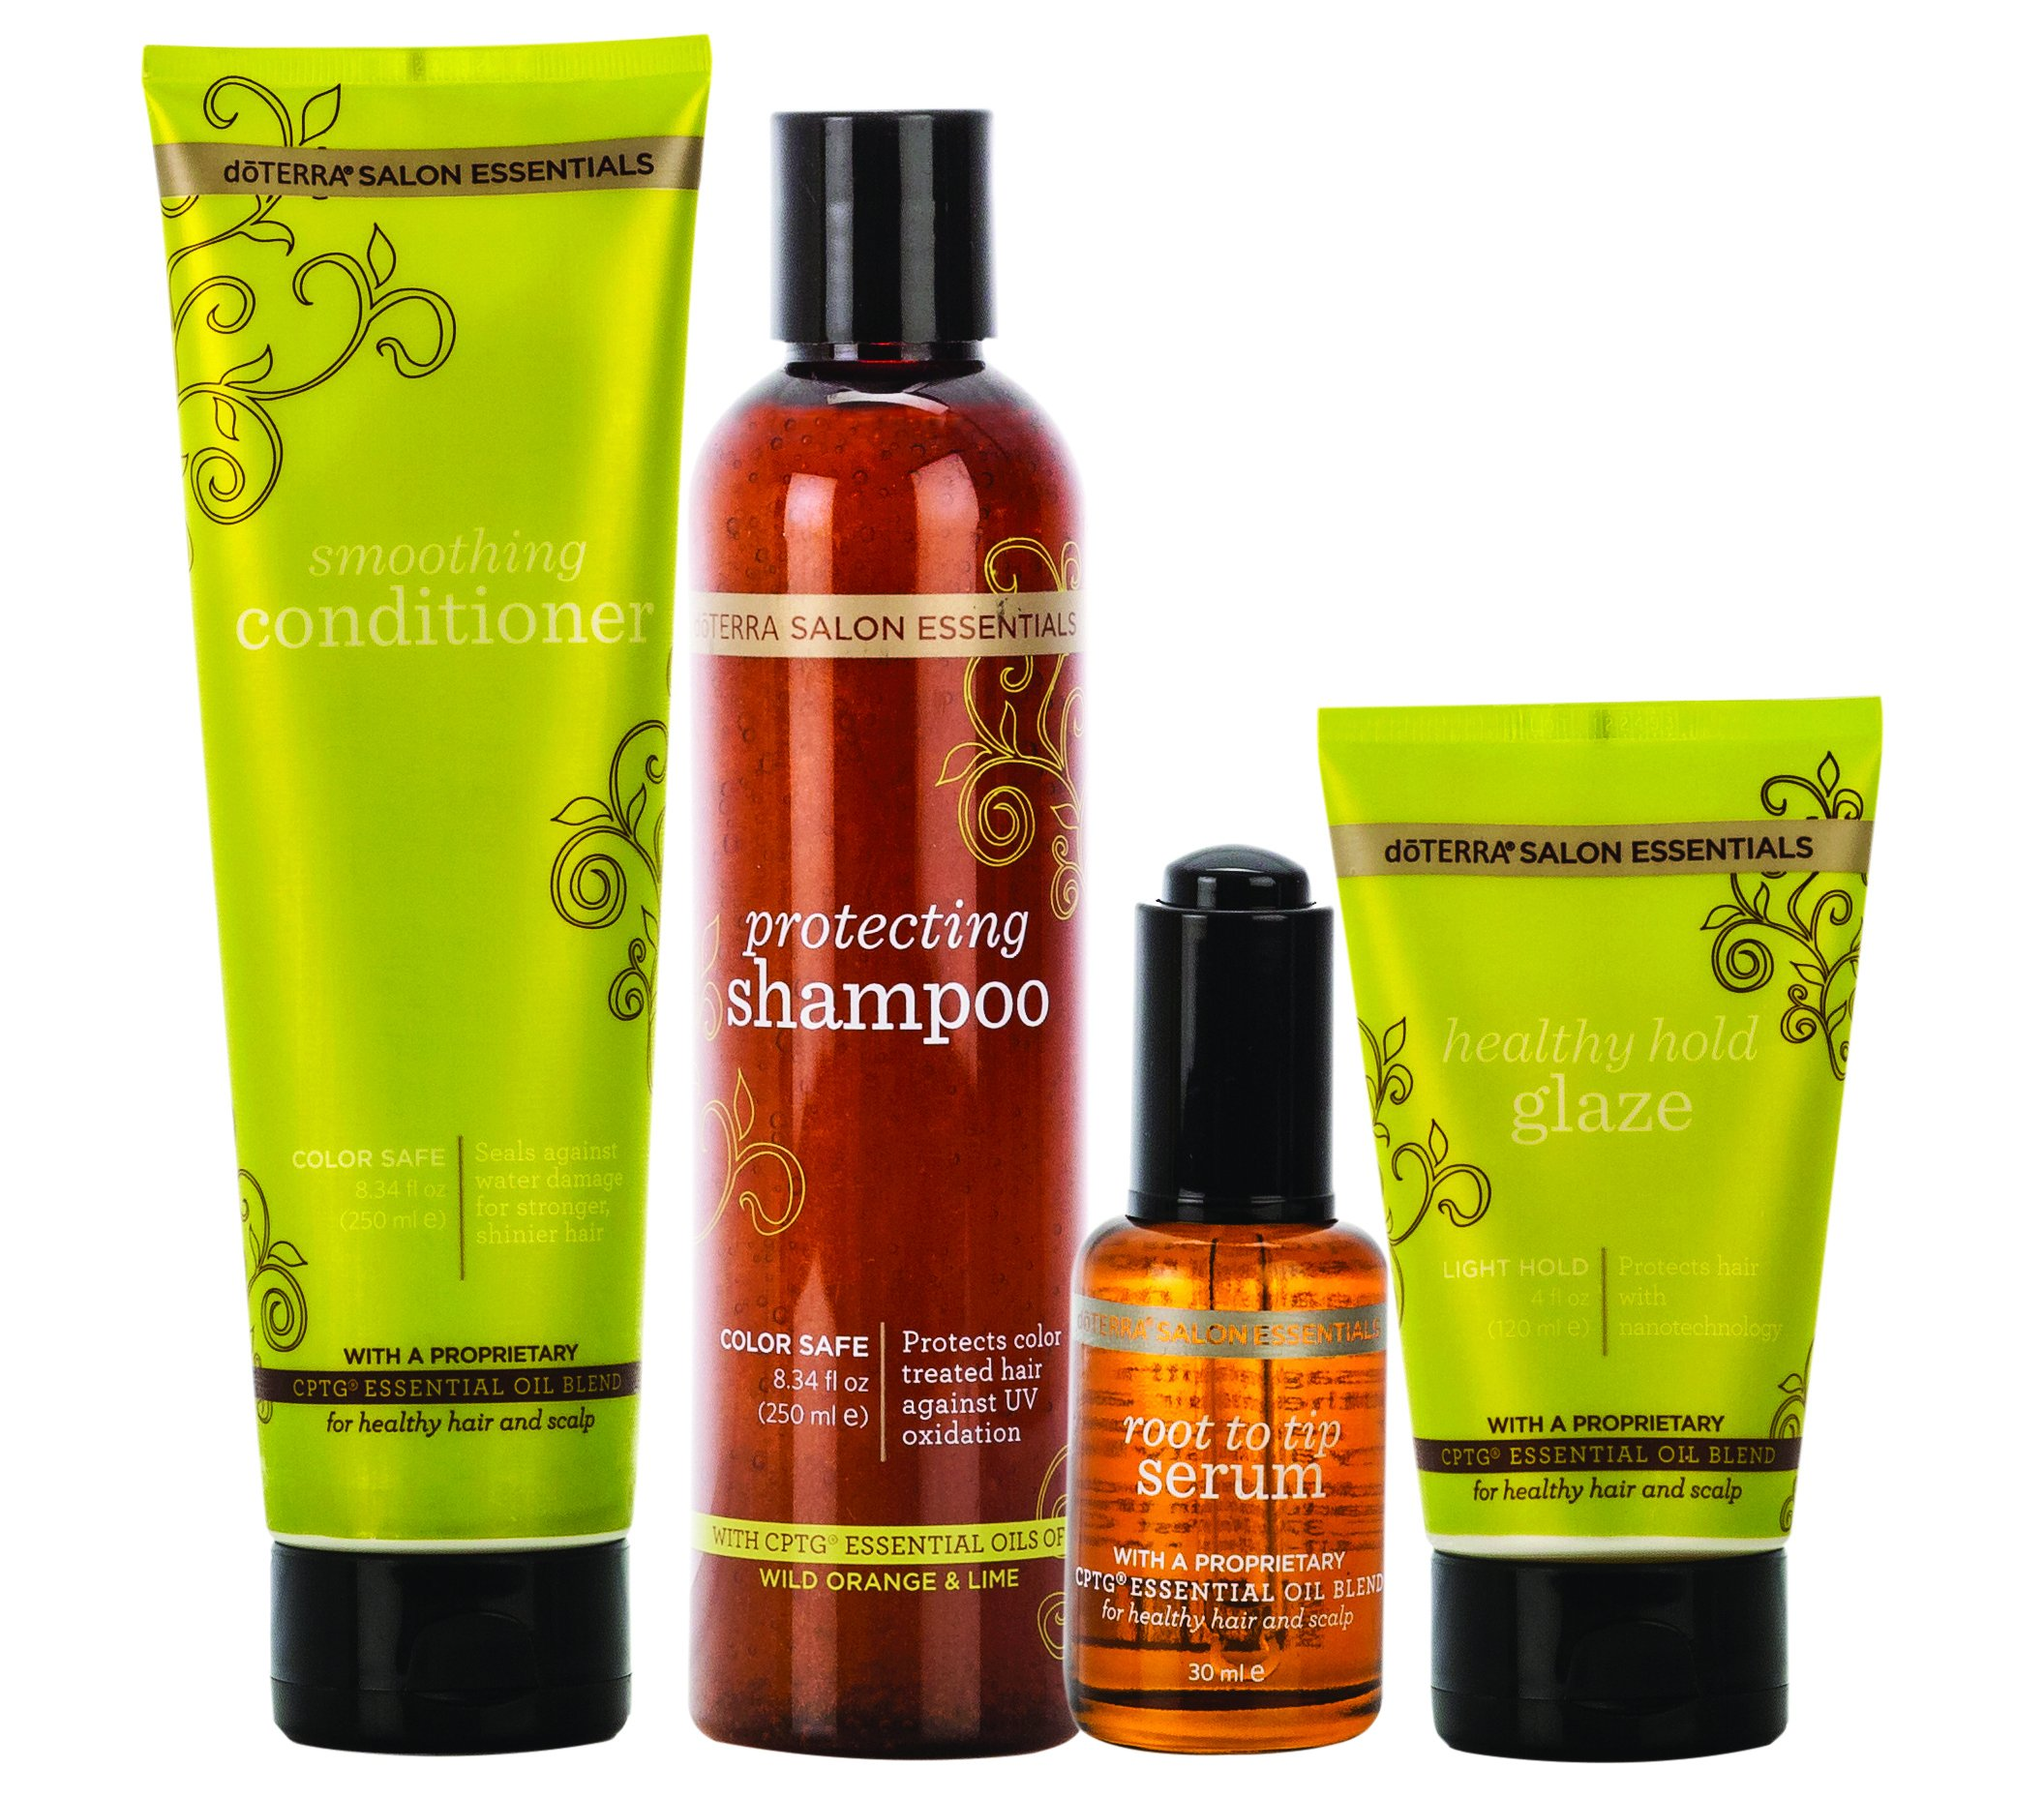 doTERRA Salon Essentials Hair Care System